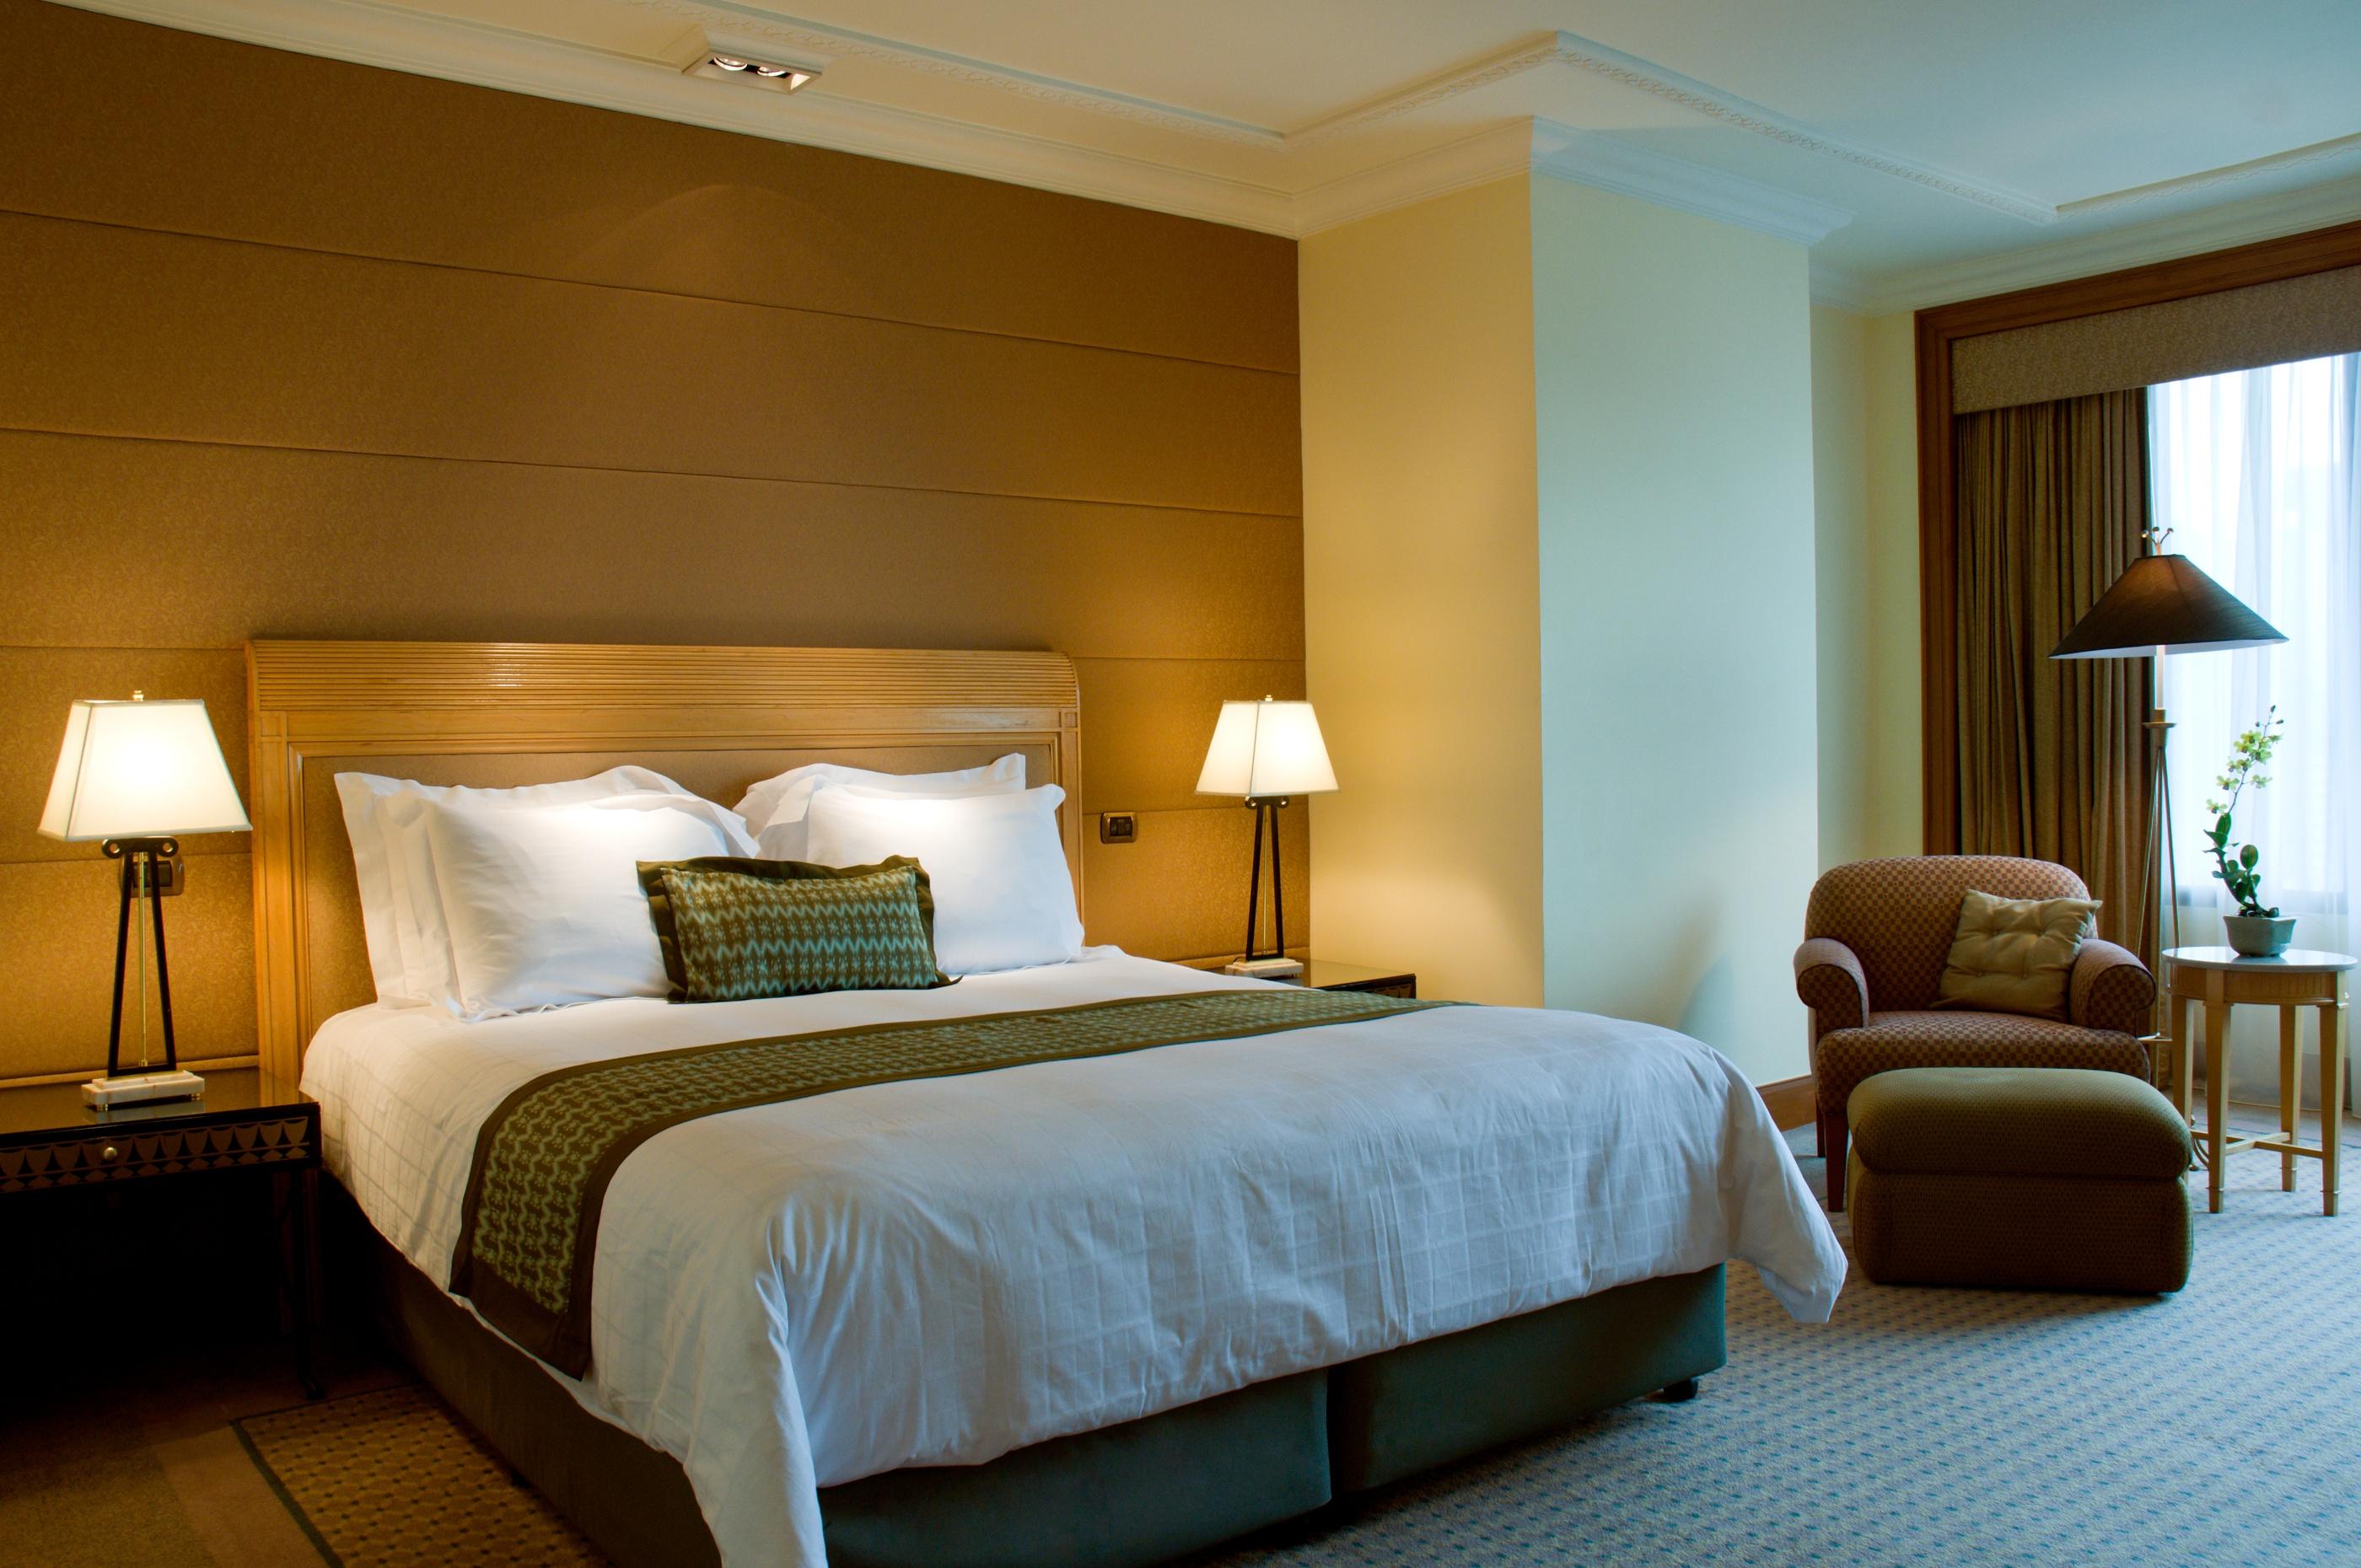 bigstock-Classic-bedroom-of-a--star-lu-7031614.jpg